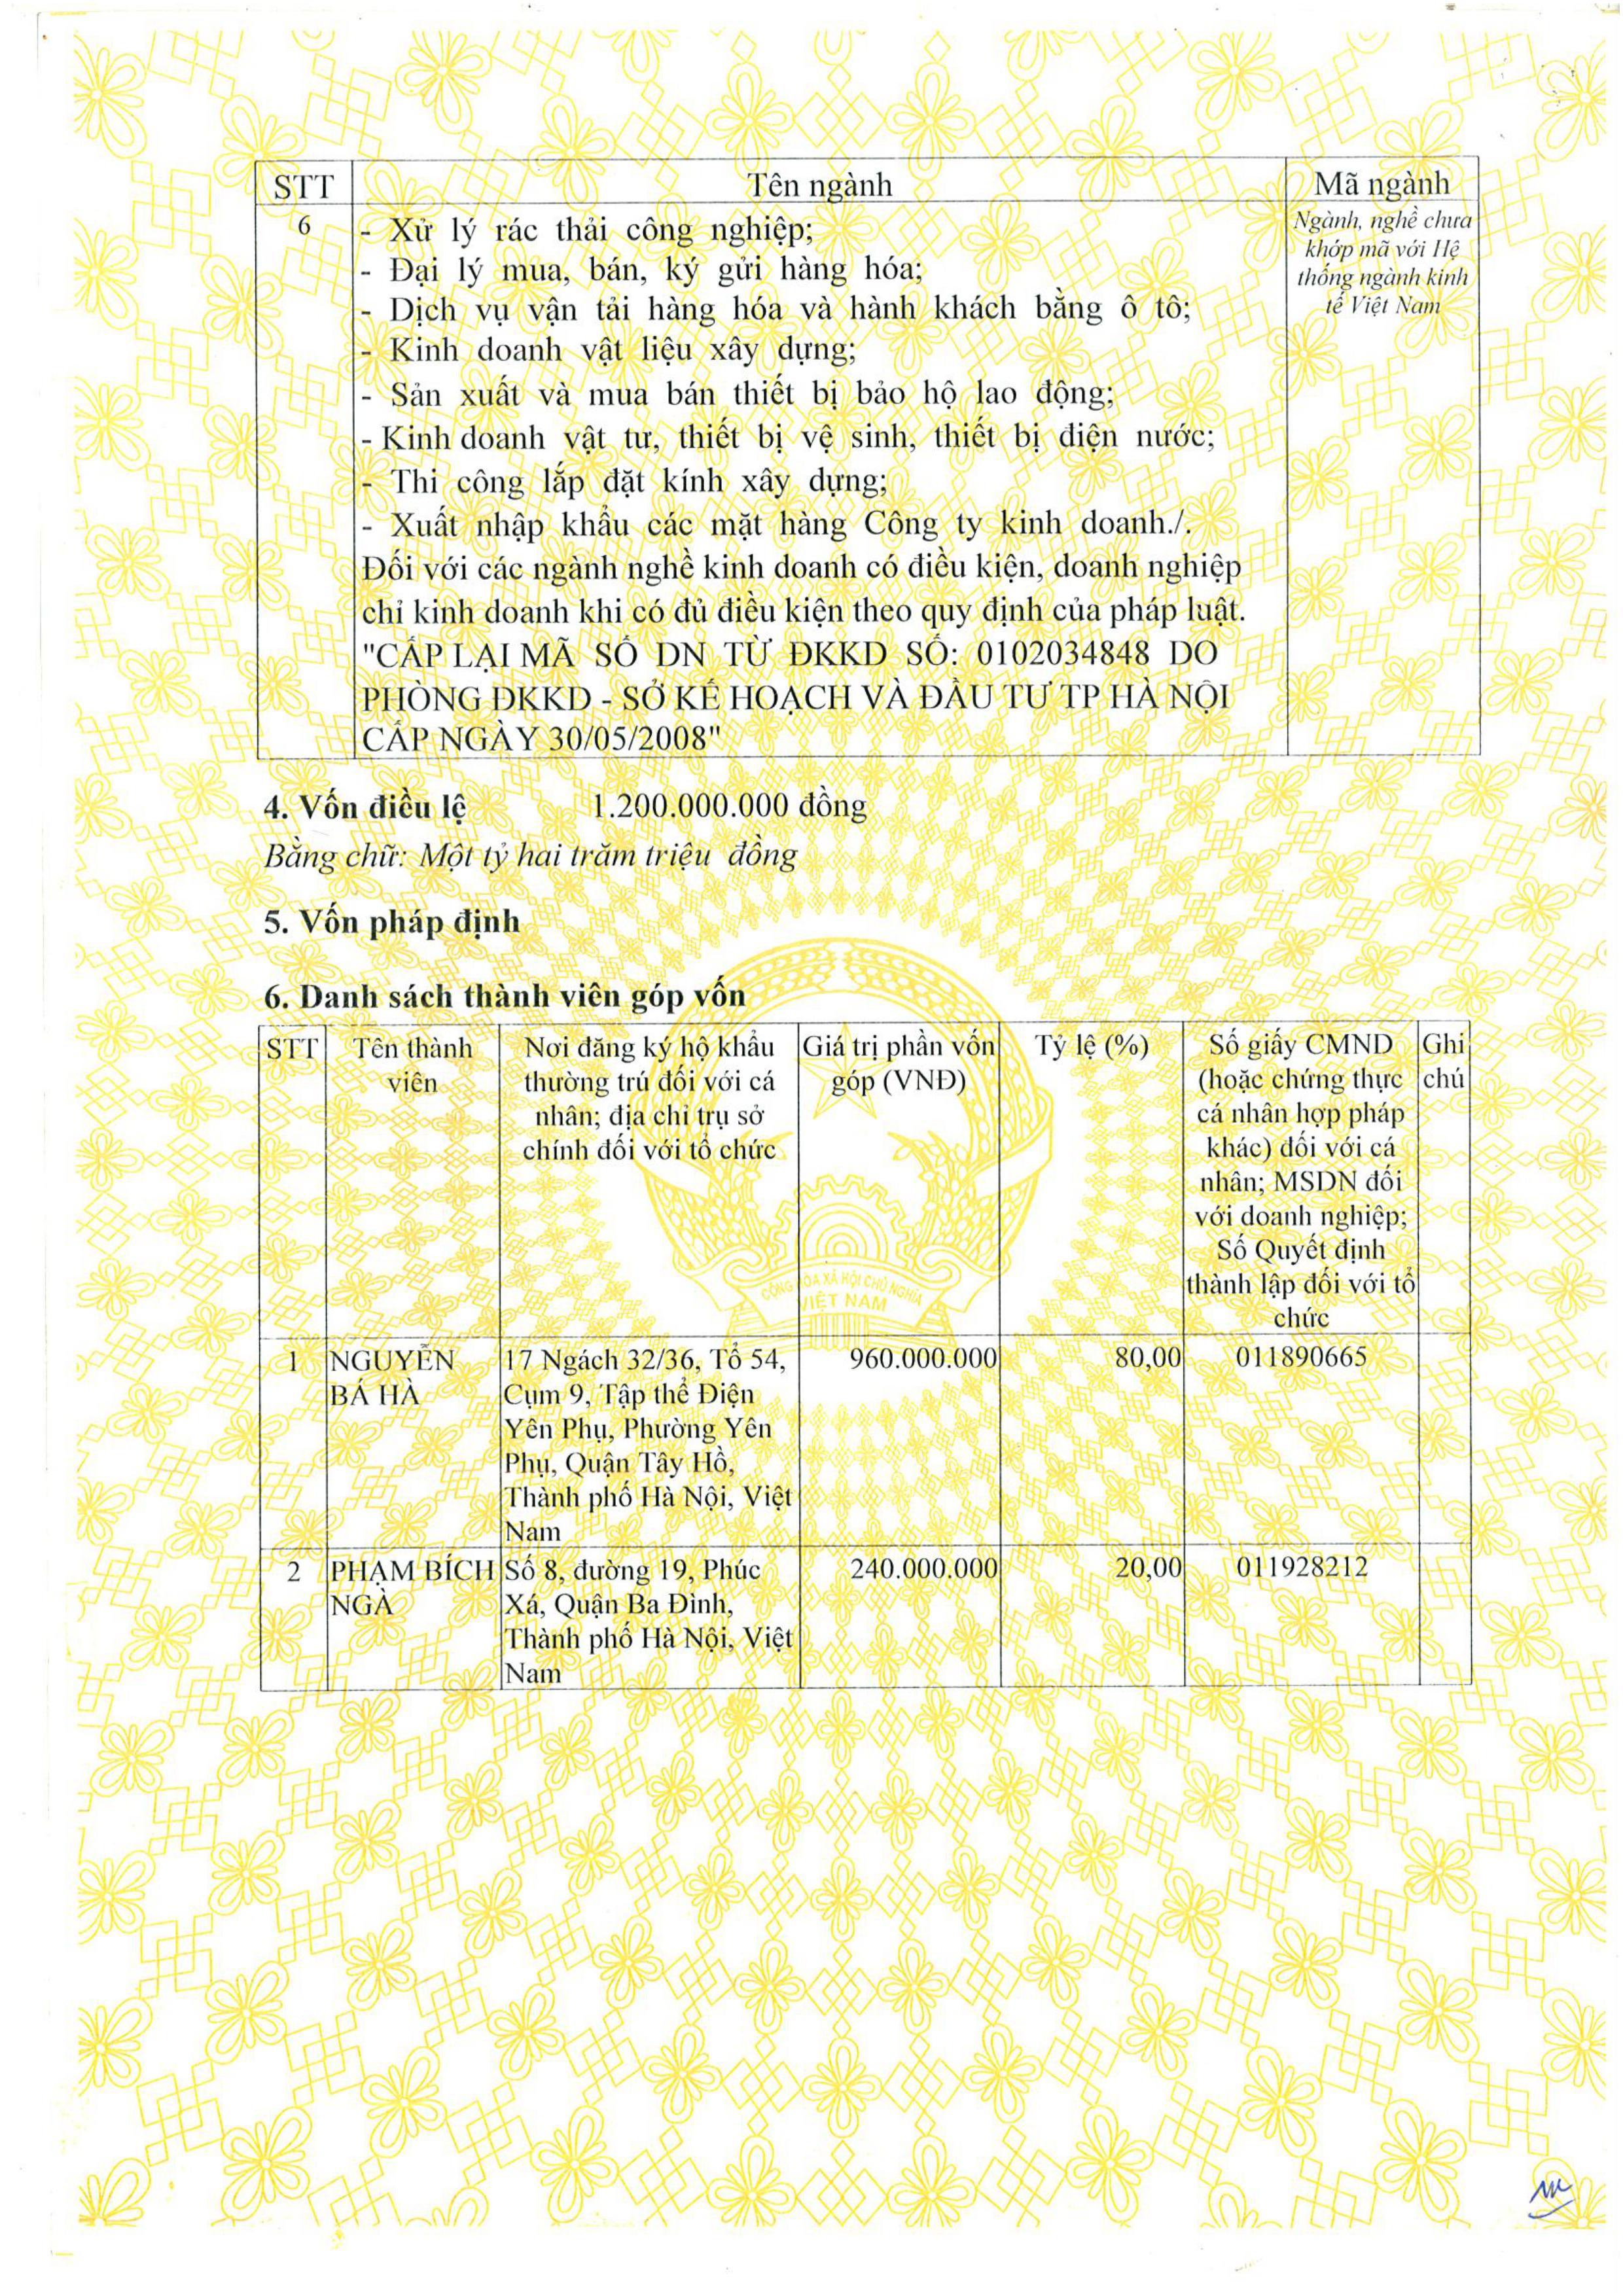 giấy đăng ký kinh doanh 2